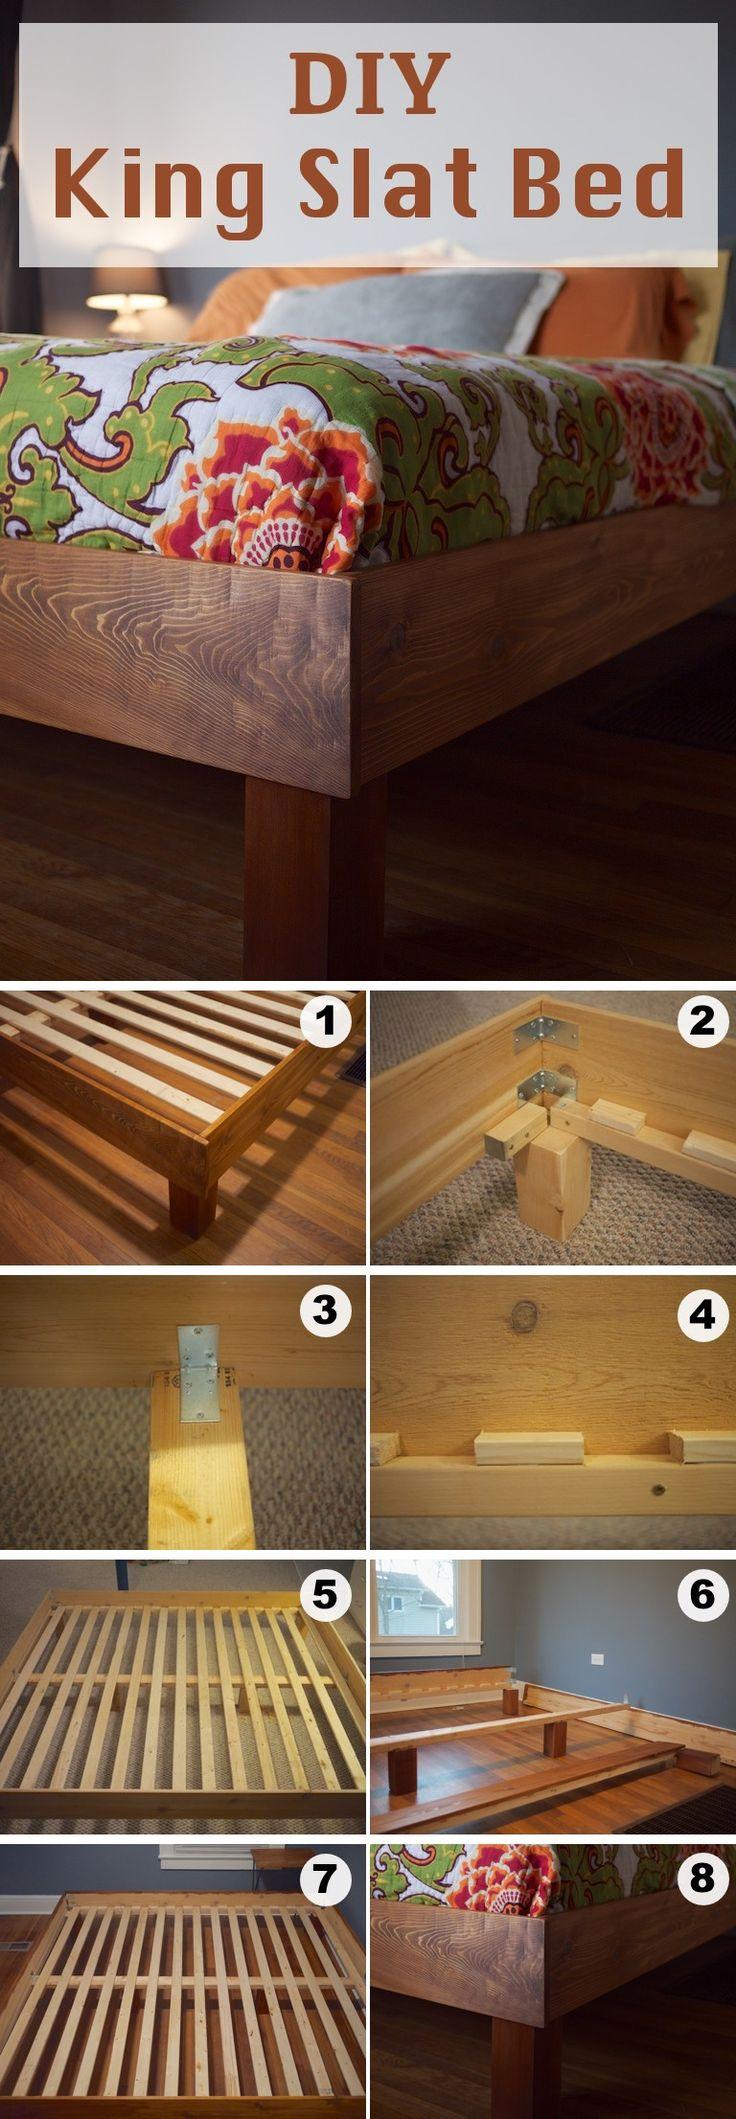 DIY King Slat Bed